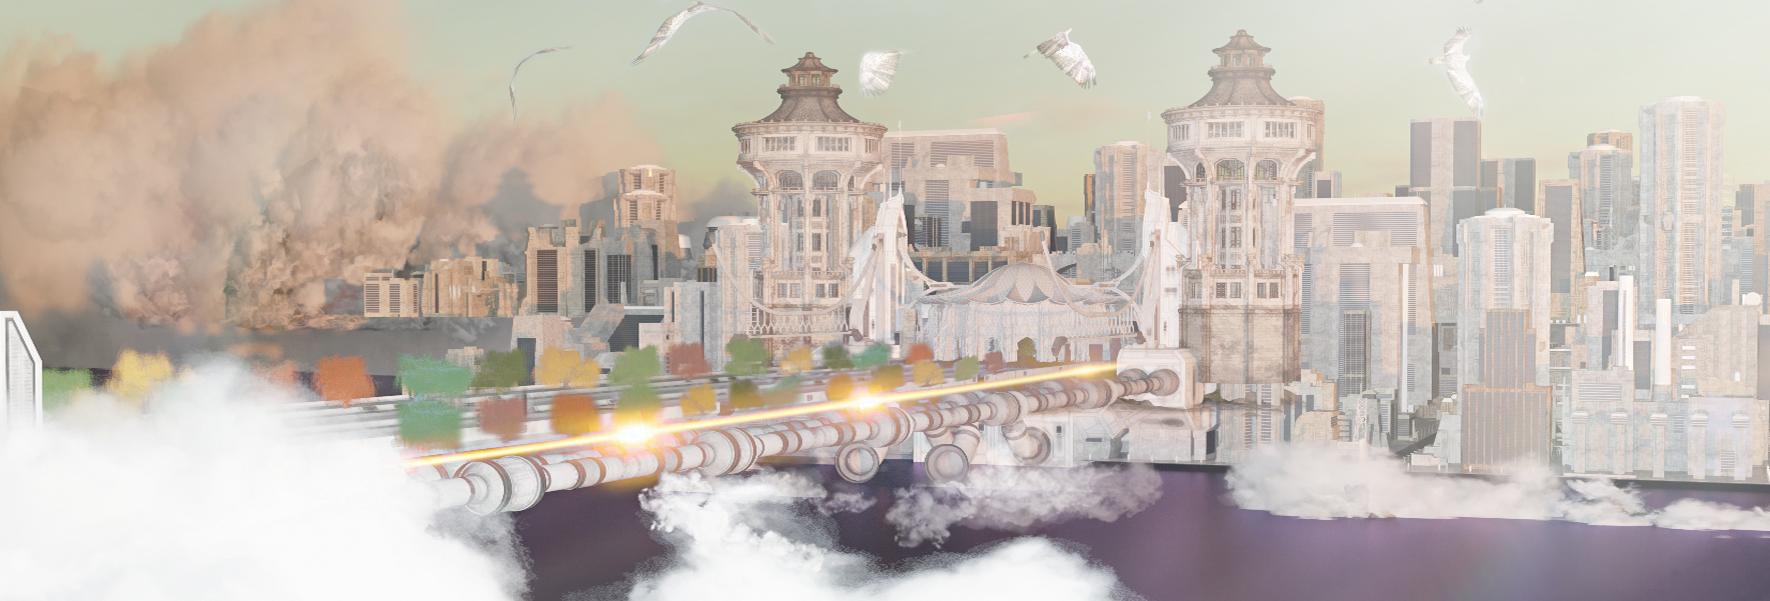 The Grand Acropolis